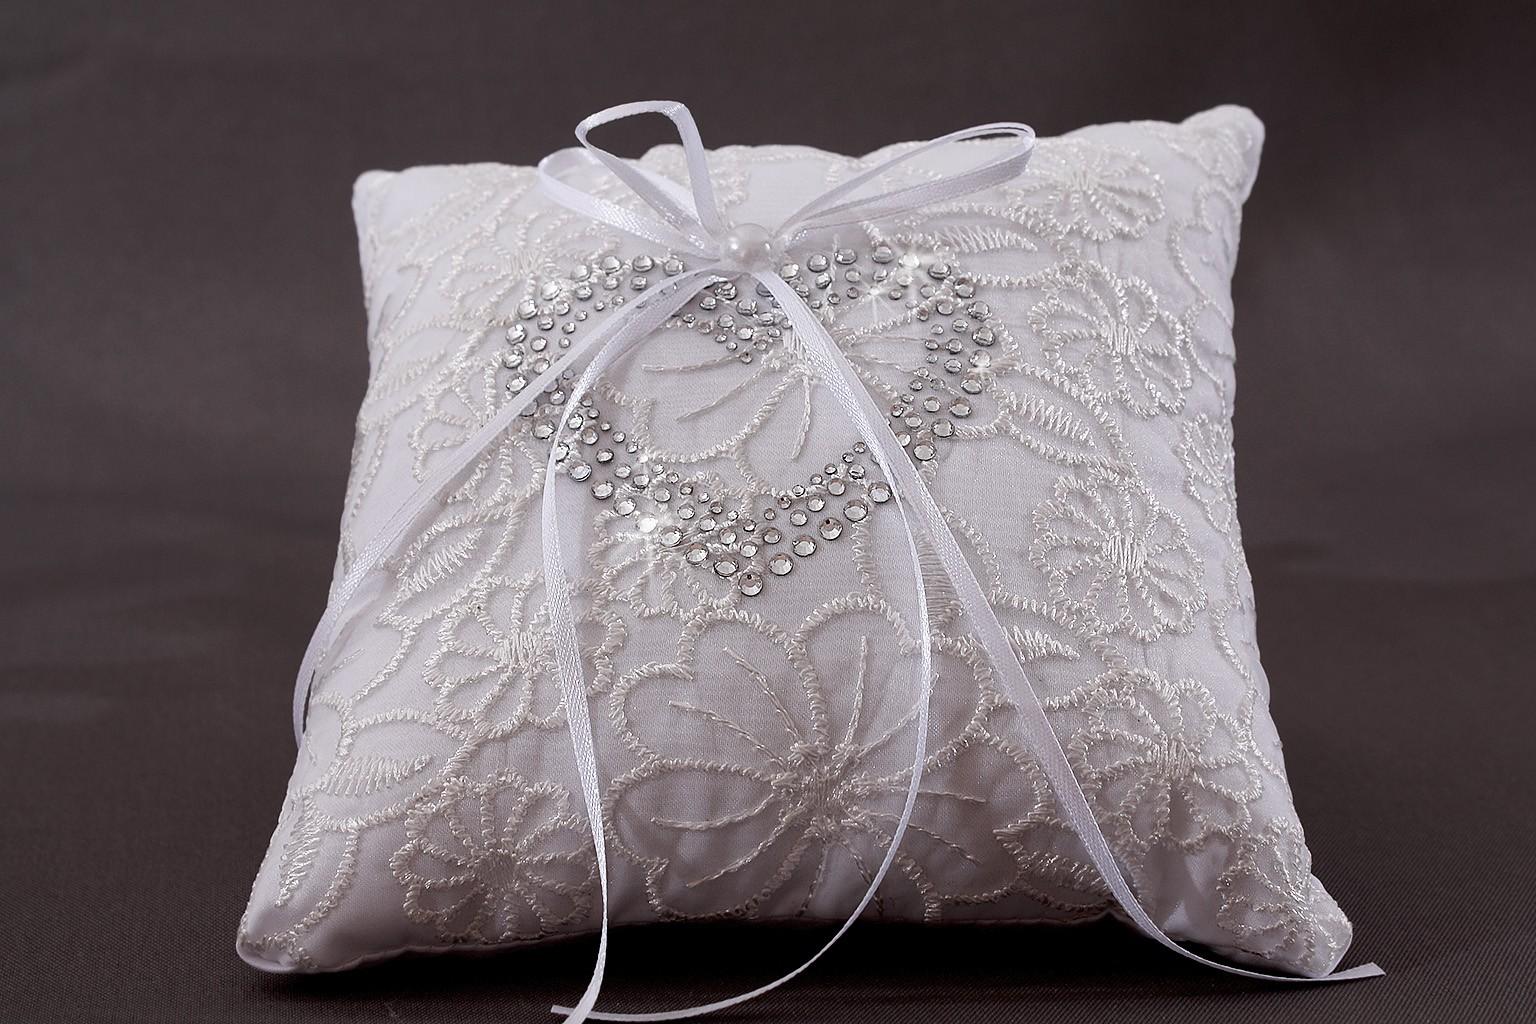 coussin mariage porte alliances blanc broderie fleur coeur strass. Black Bedroom Furniture Sets. Home Design Ideas